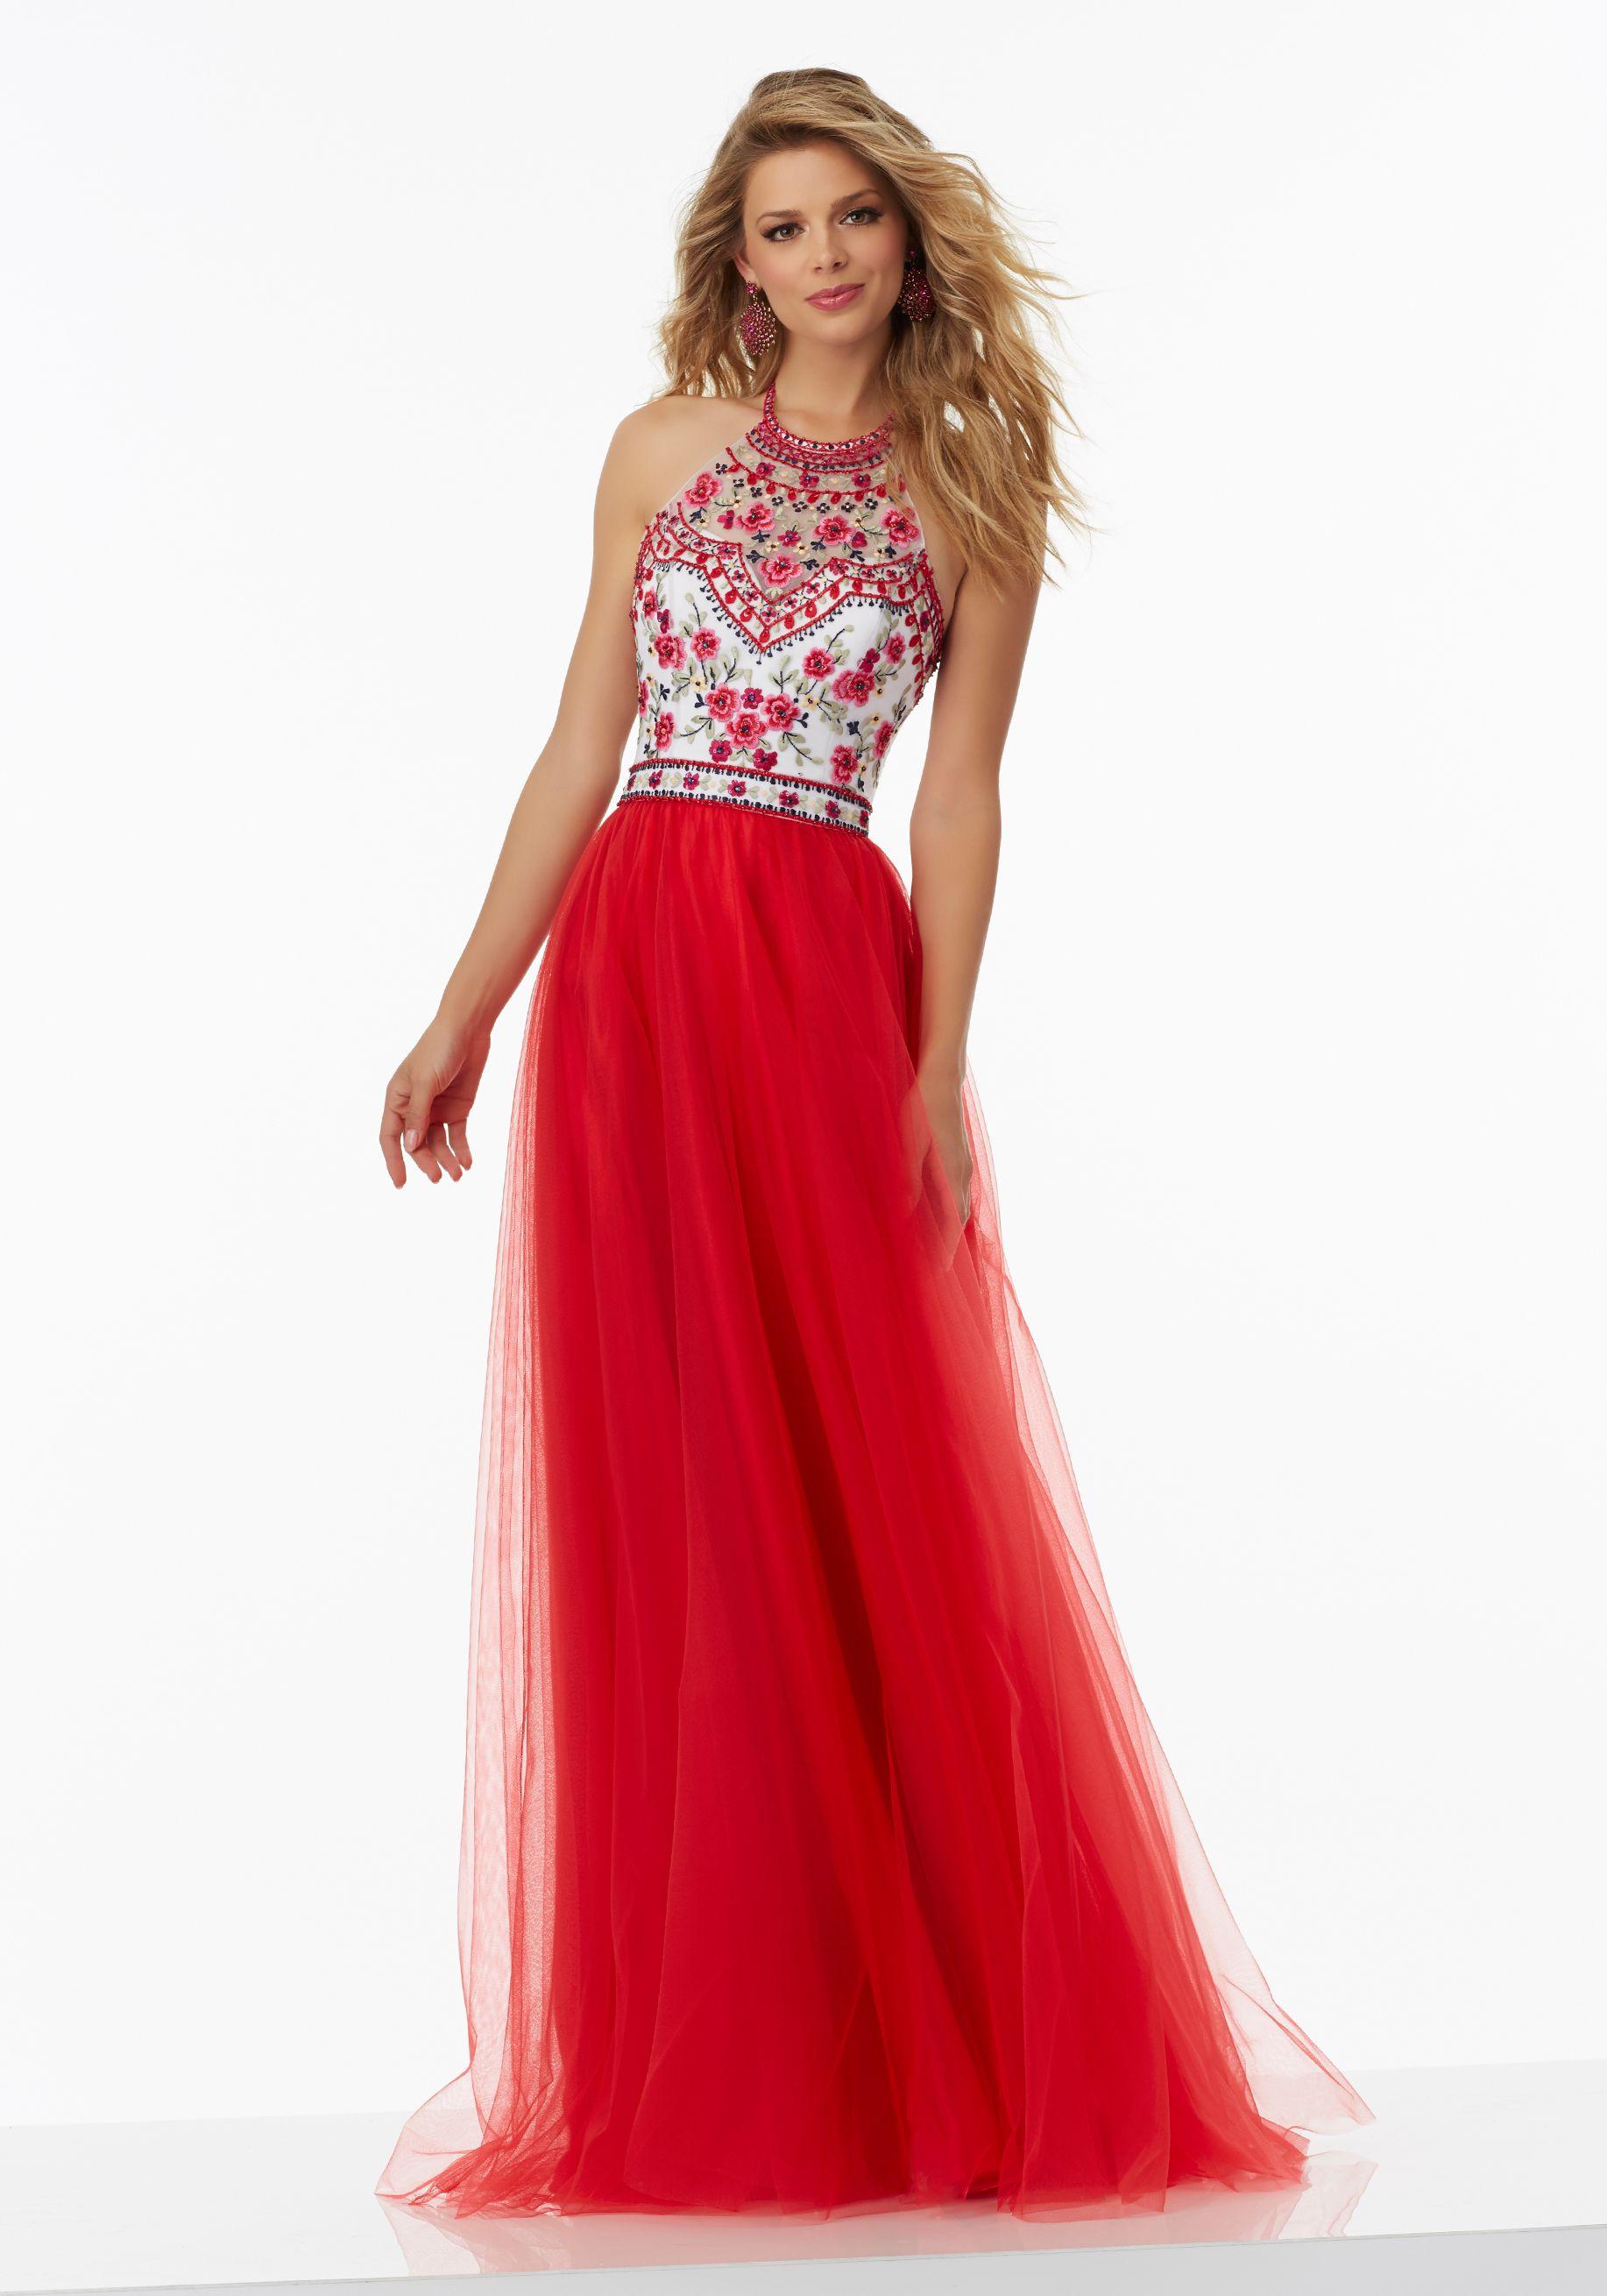 Prom Dresses by Morilee designed by Madeline Gardner. Soft Tulle ...